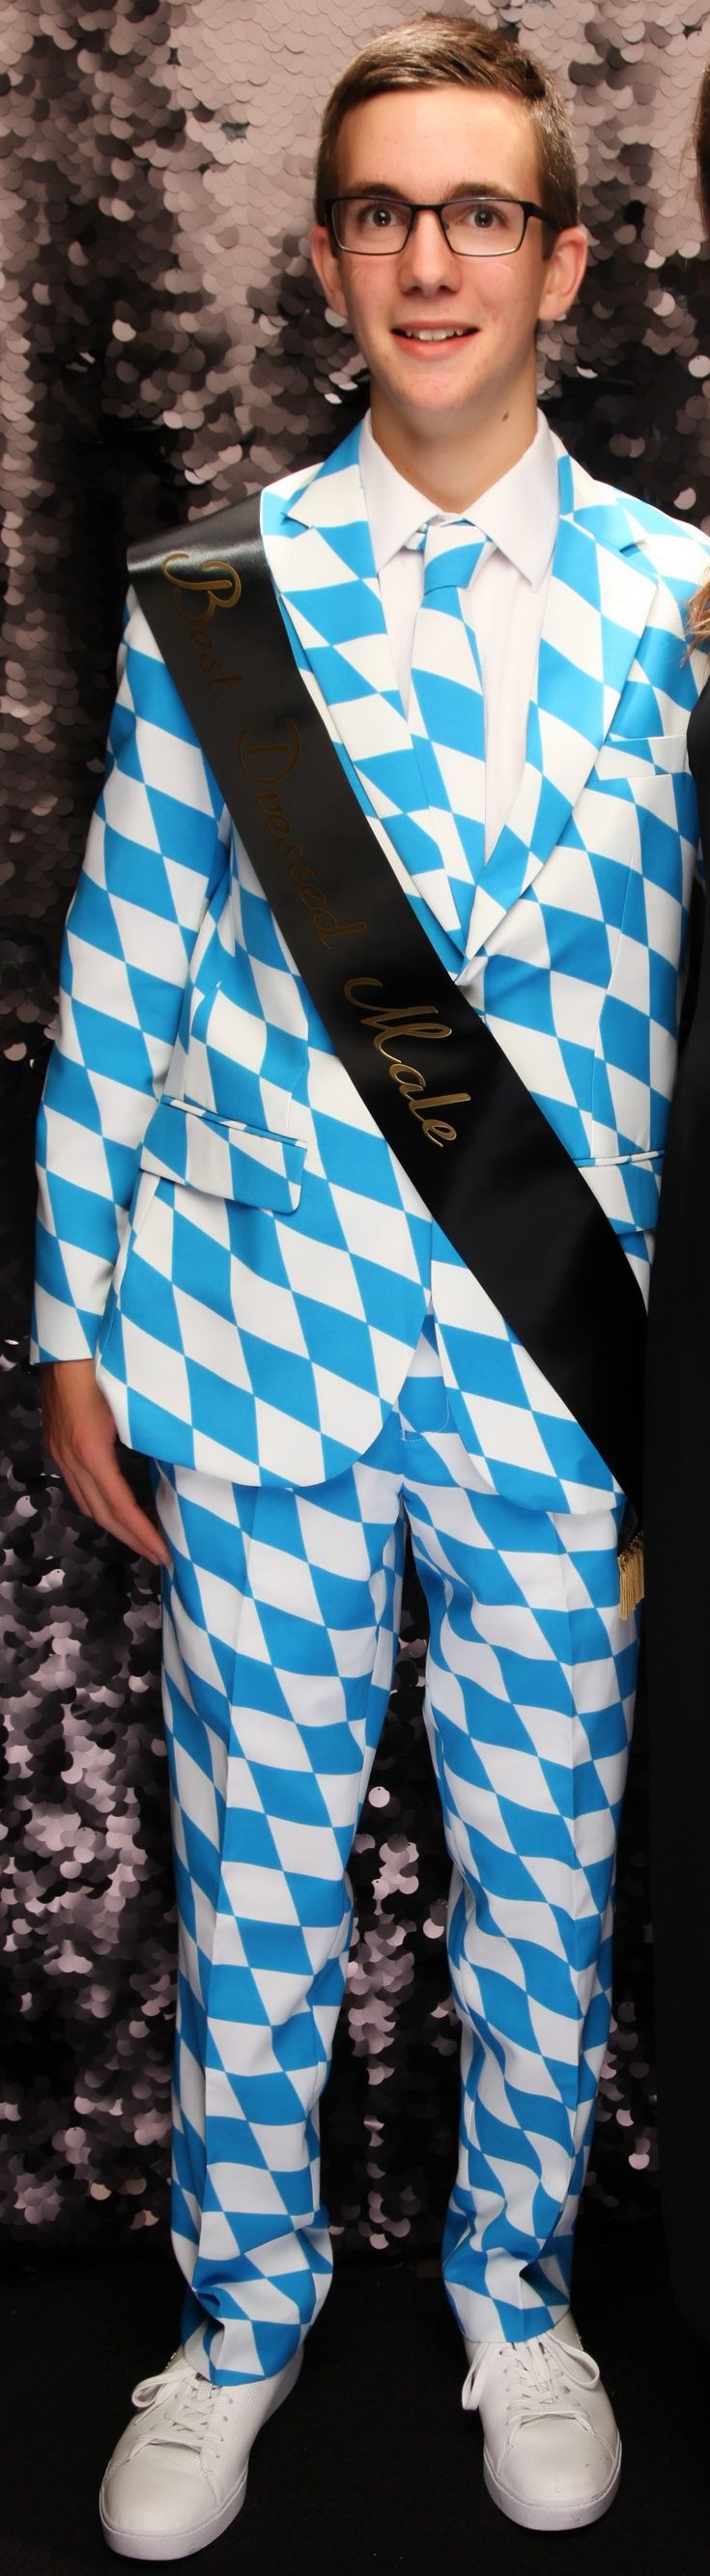 St Kentigern College Ball 2016. Best dressed male.  www.whitedoor.co.nz